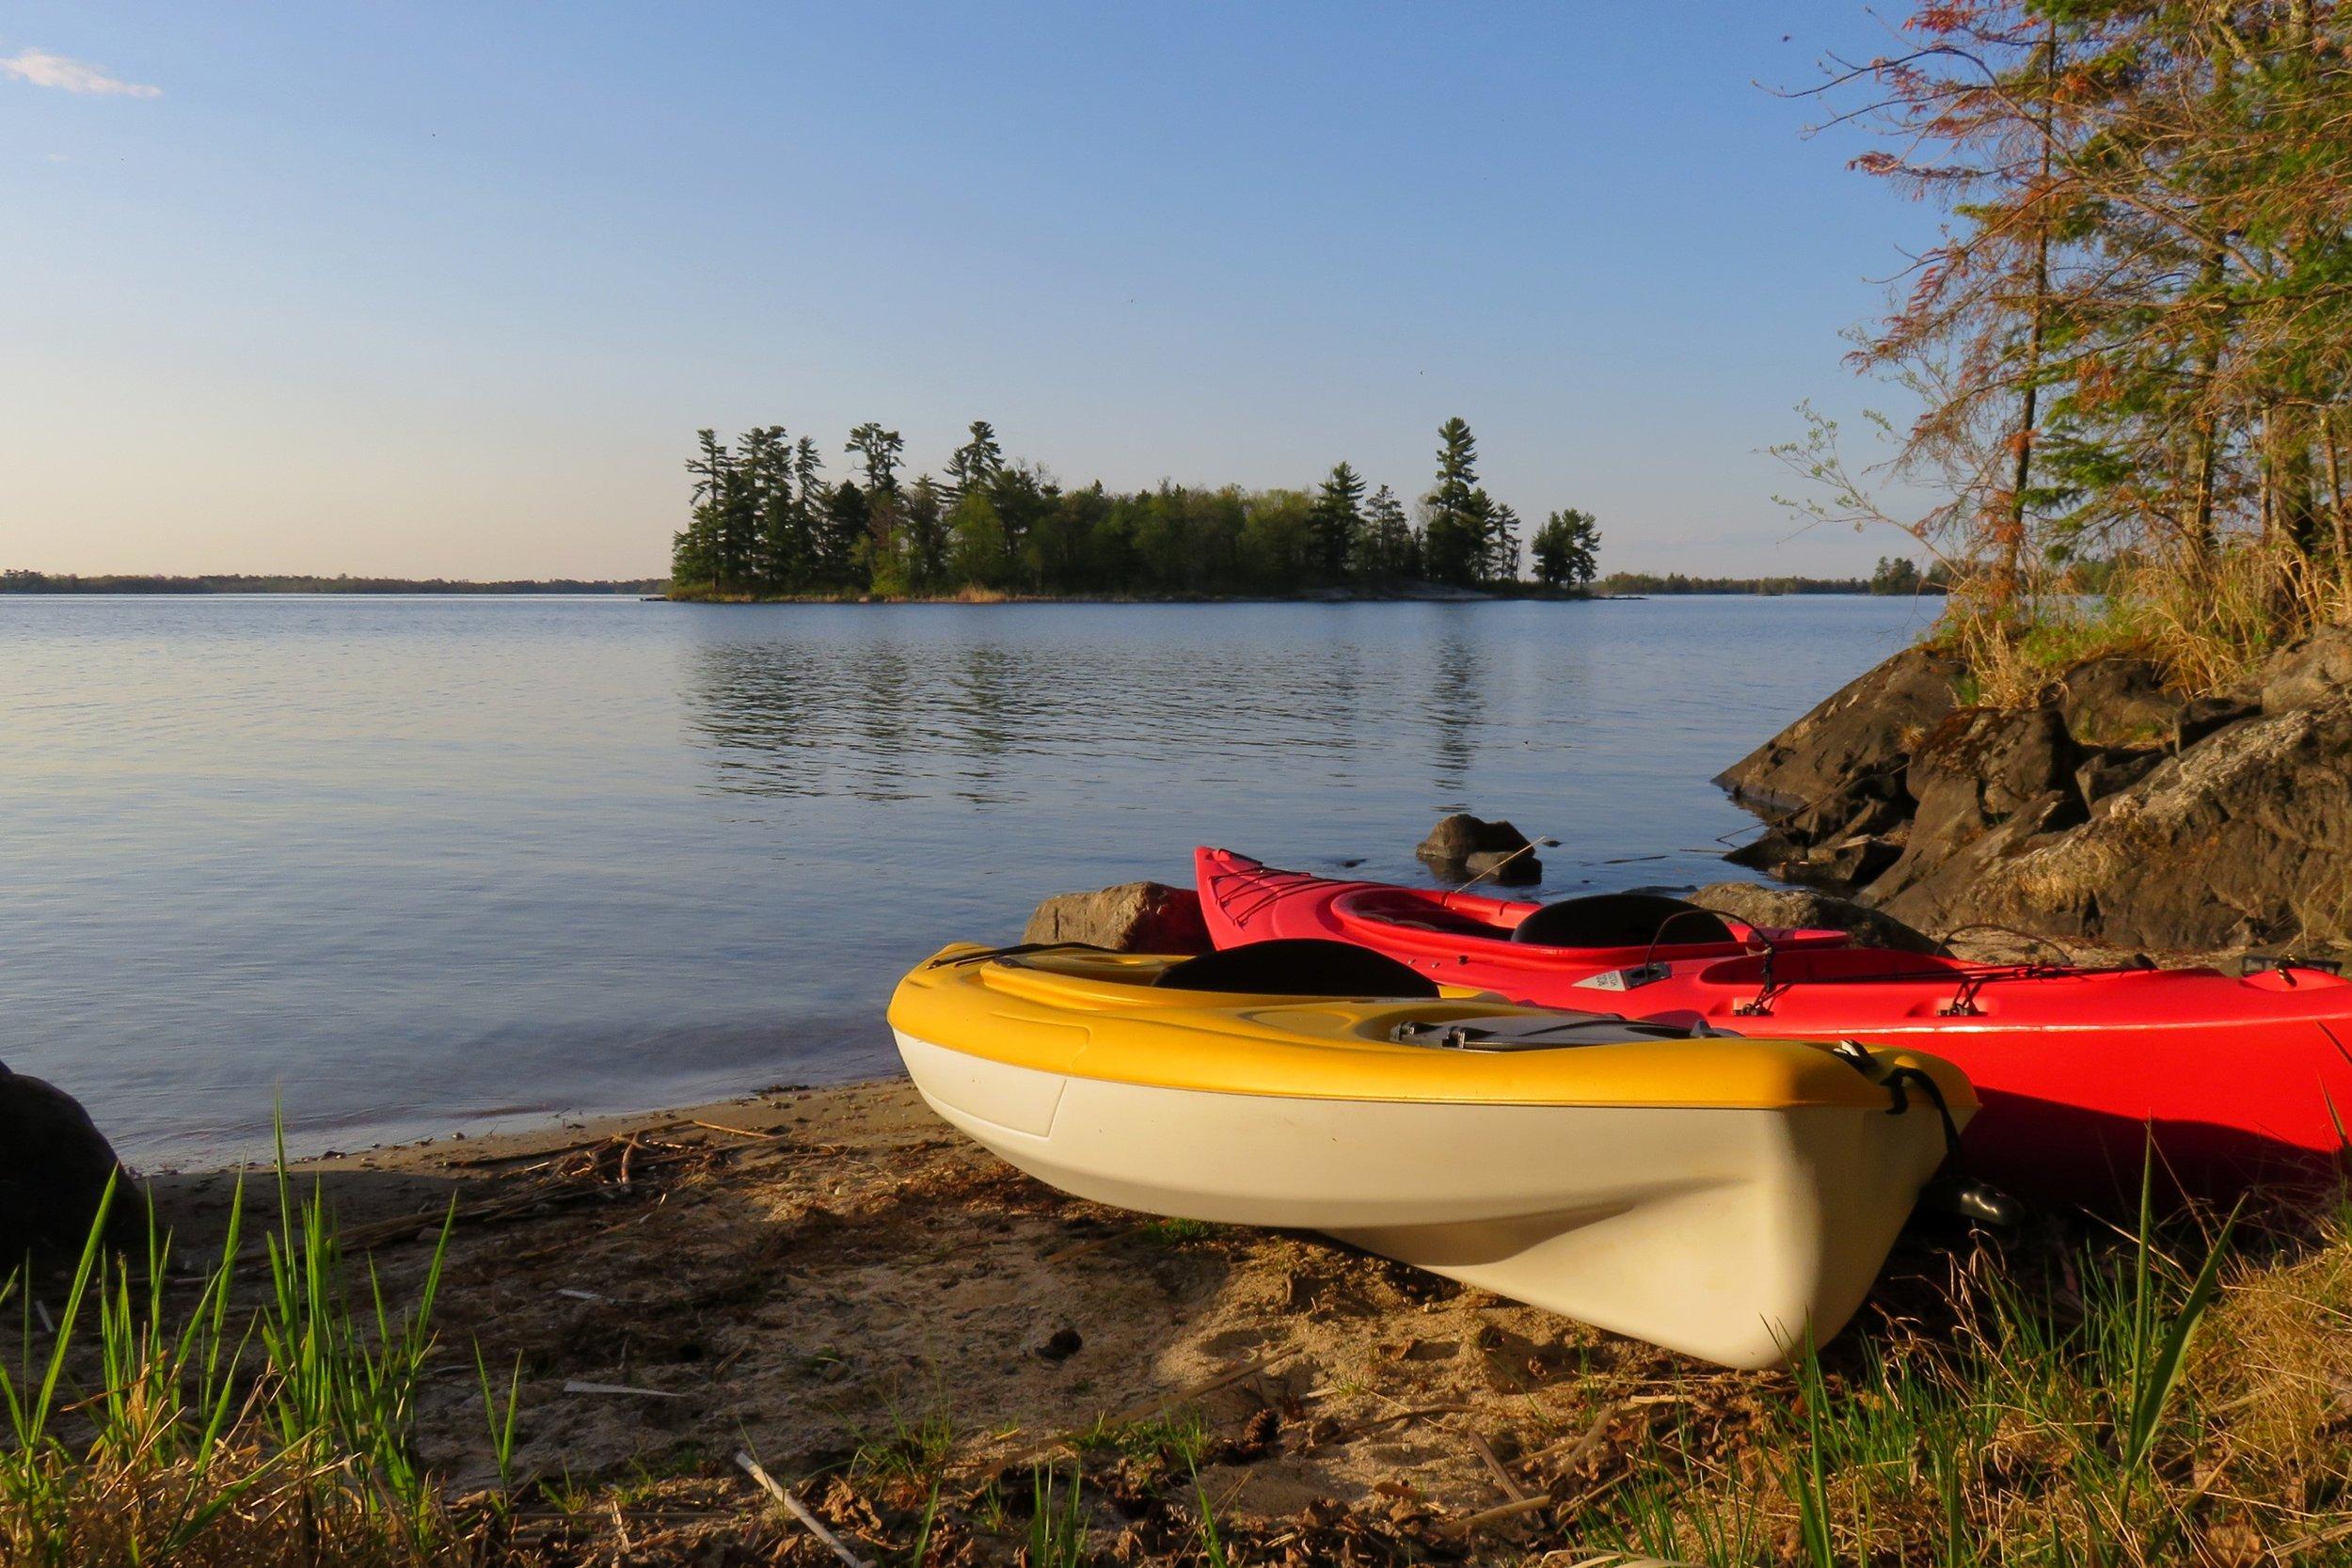 News — Voyageurs National Park Association